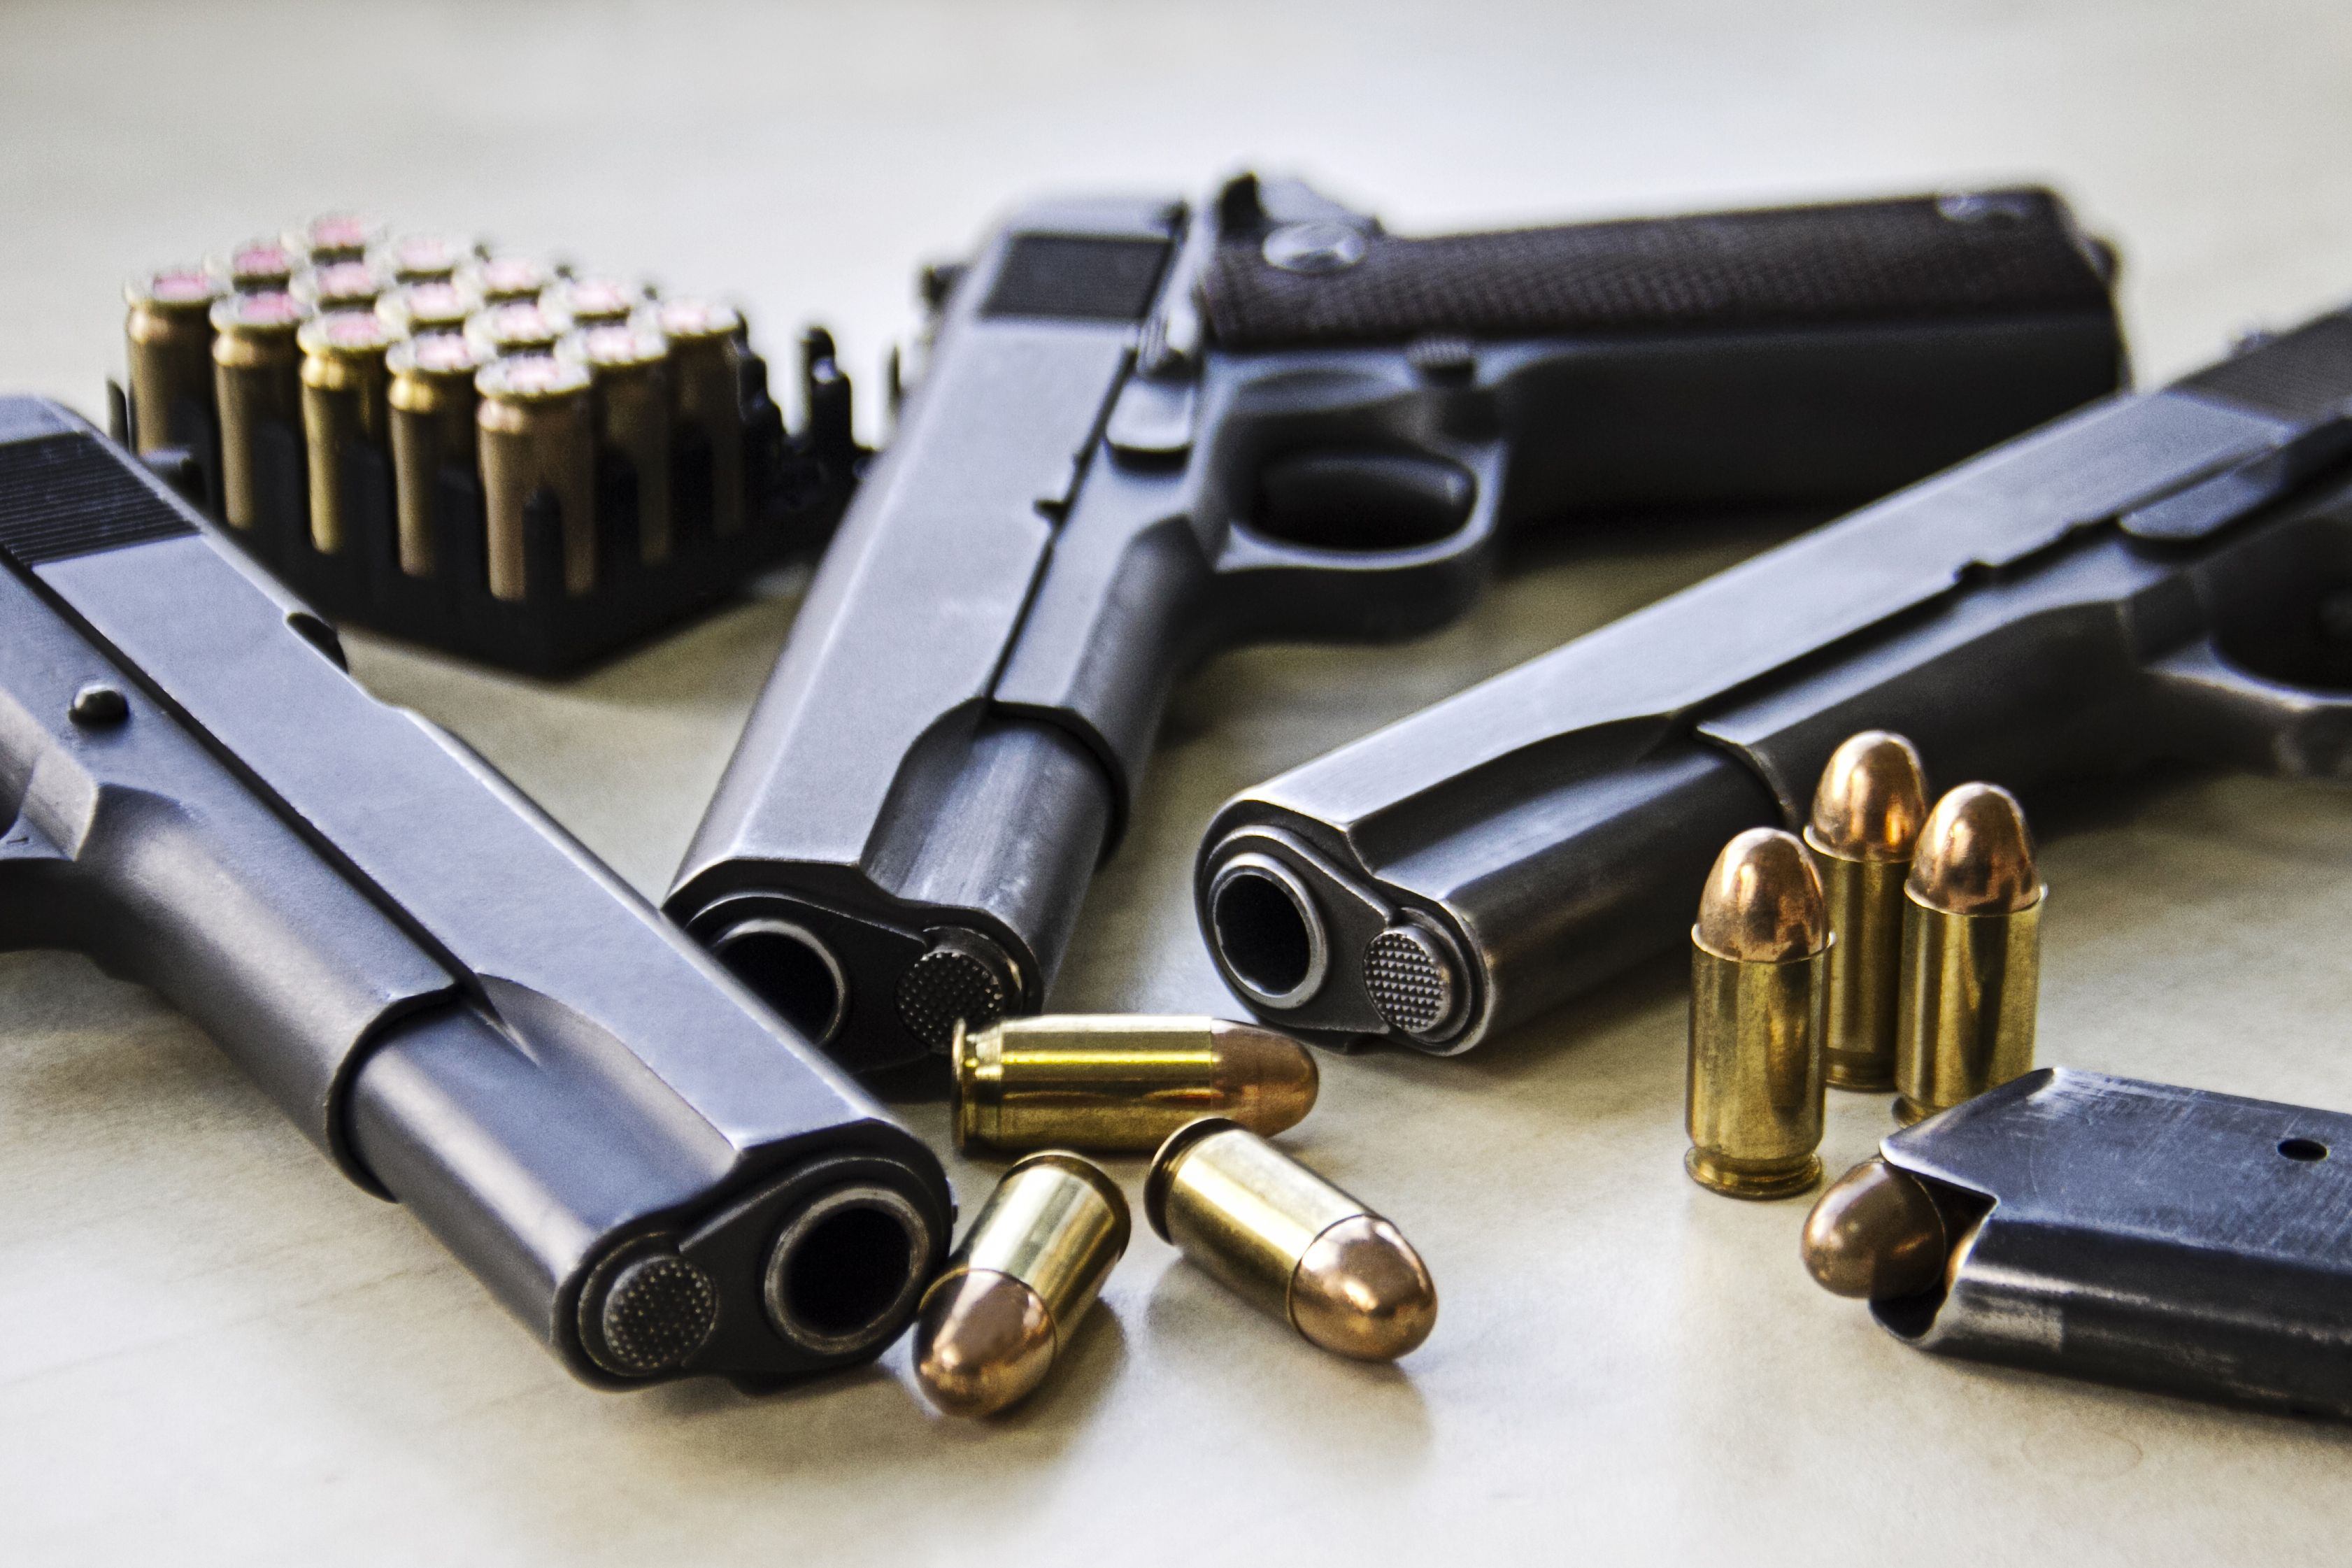 Permiso de armas: Servicios de Centro Médico Pacar